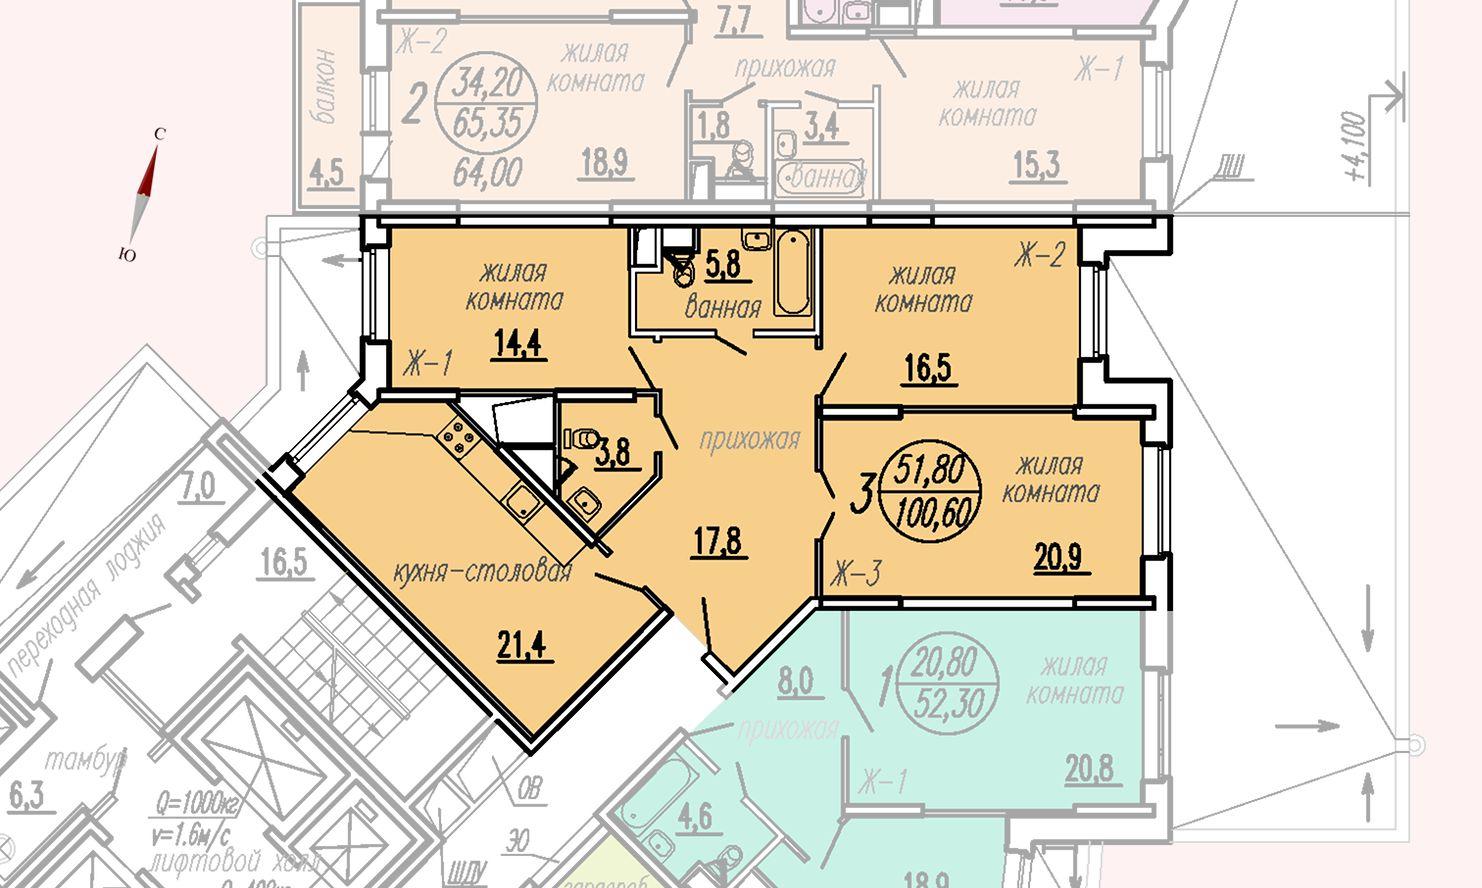 ул. Дирижабельная, д. 1, секция3, квартира 100,60 м2